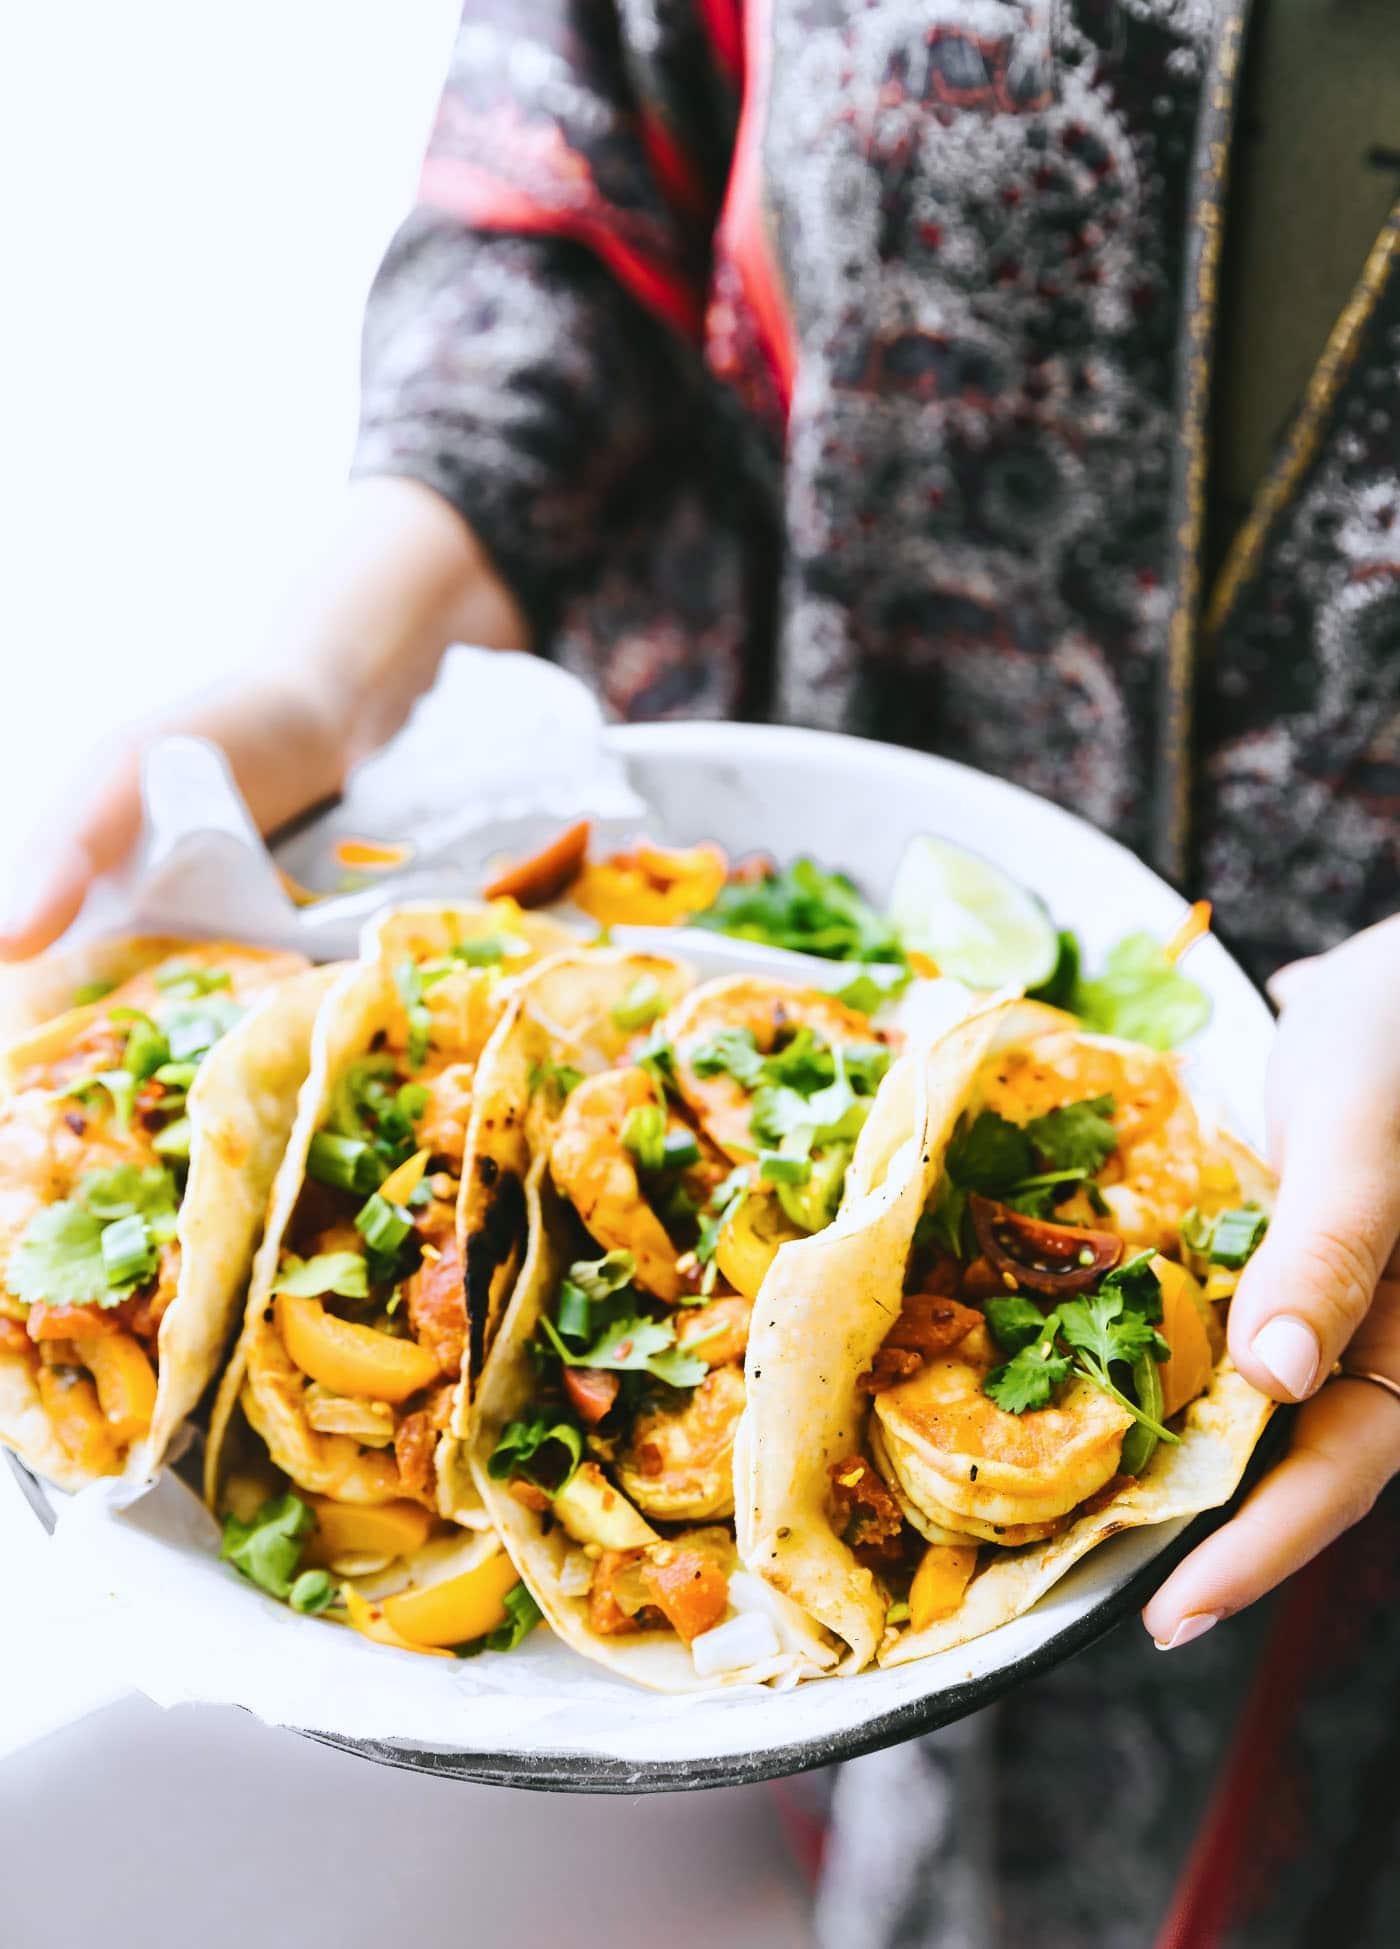 Gluten Free Crock Pot Fire Roasted Shrimp Tacos in plate